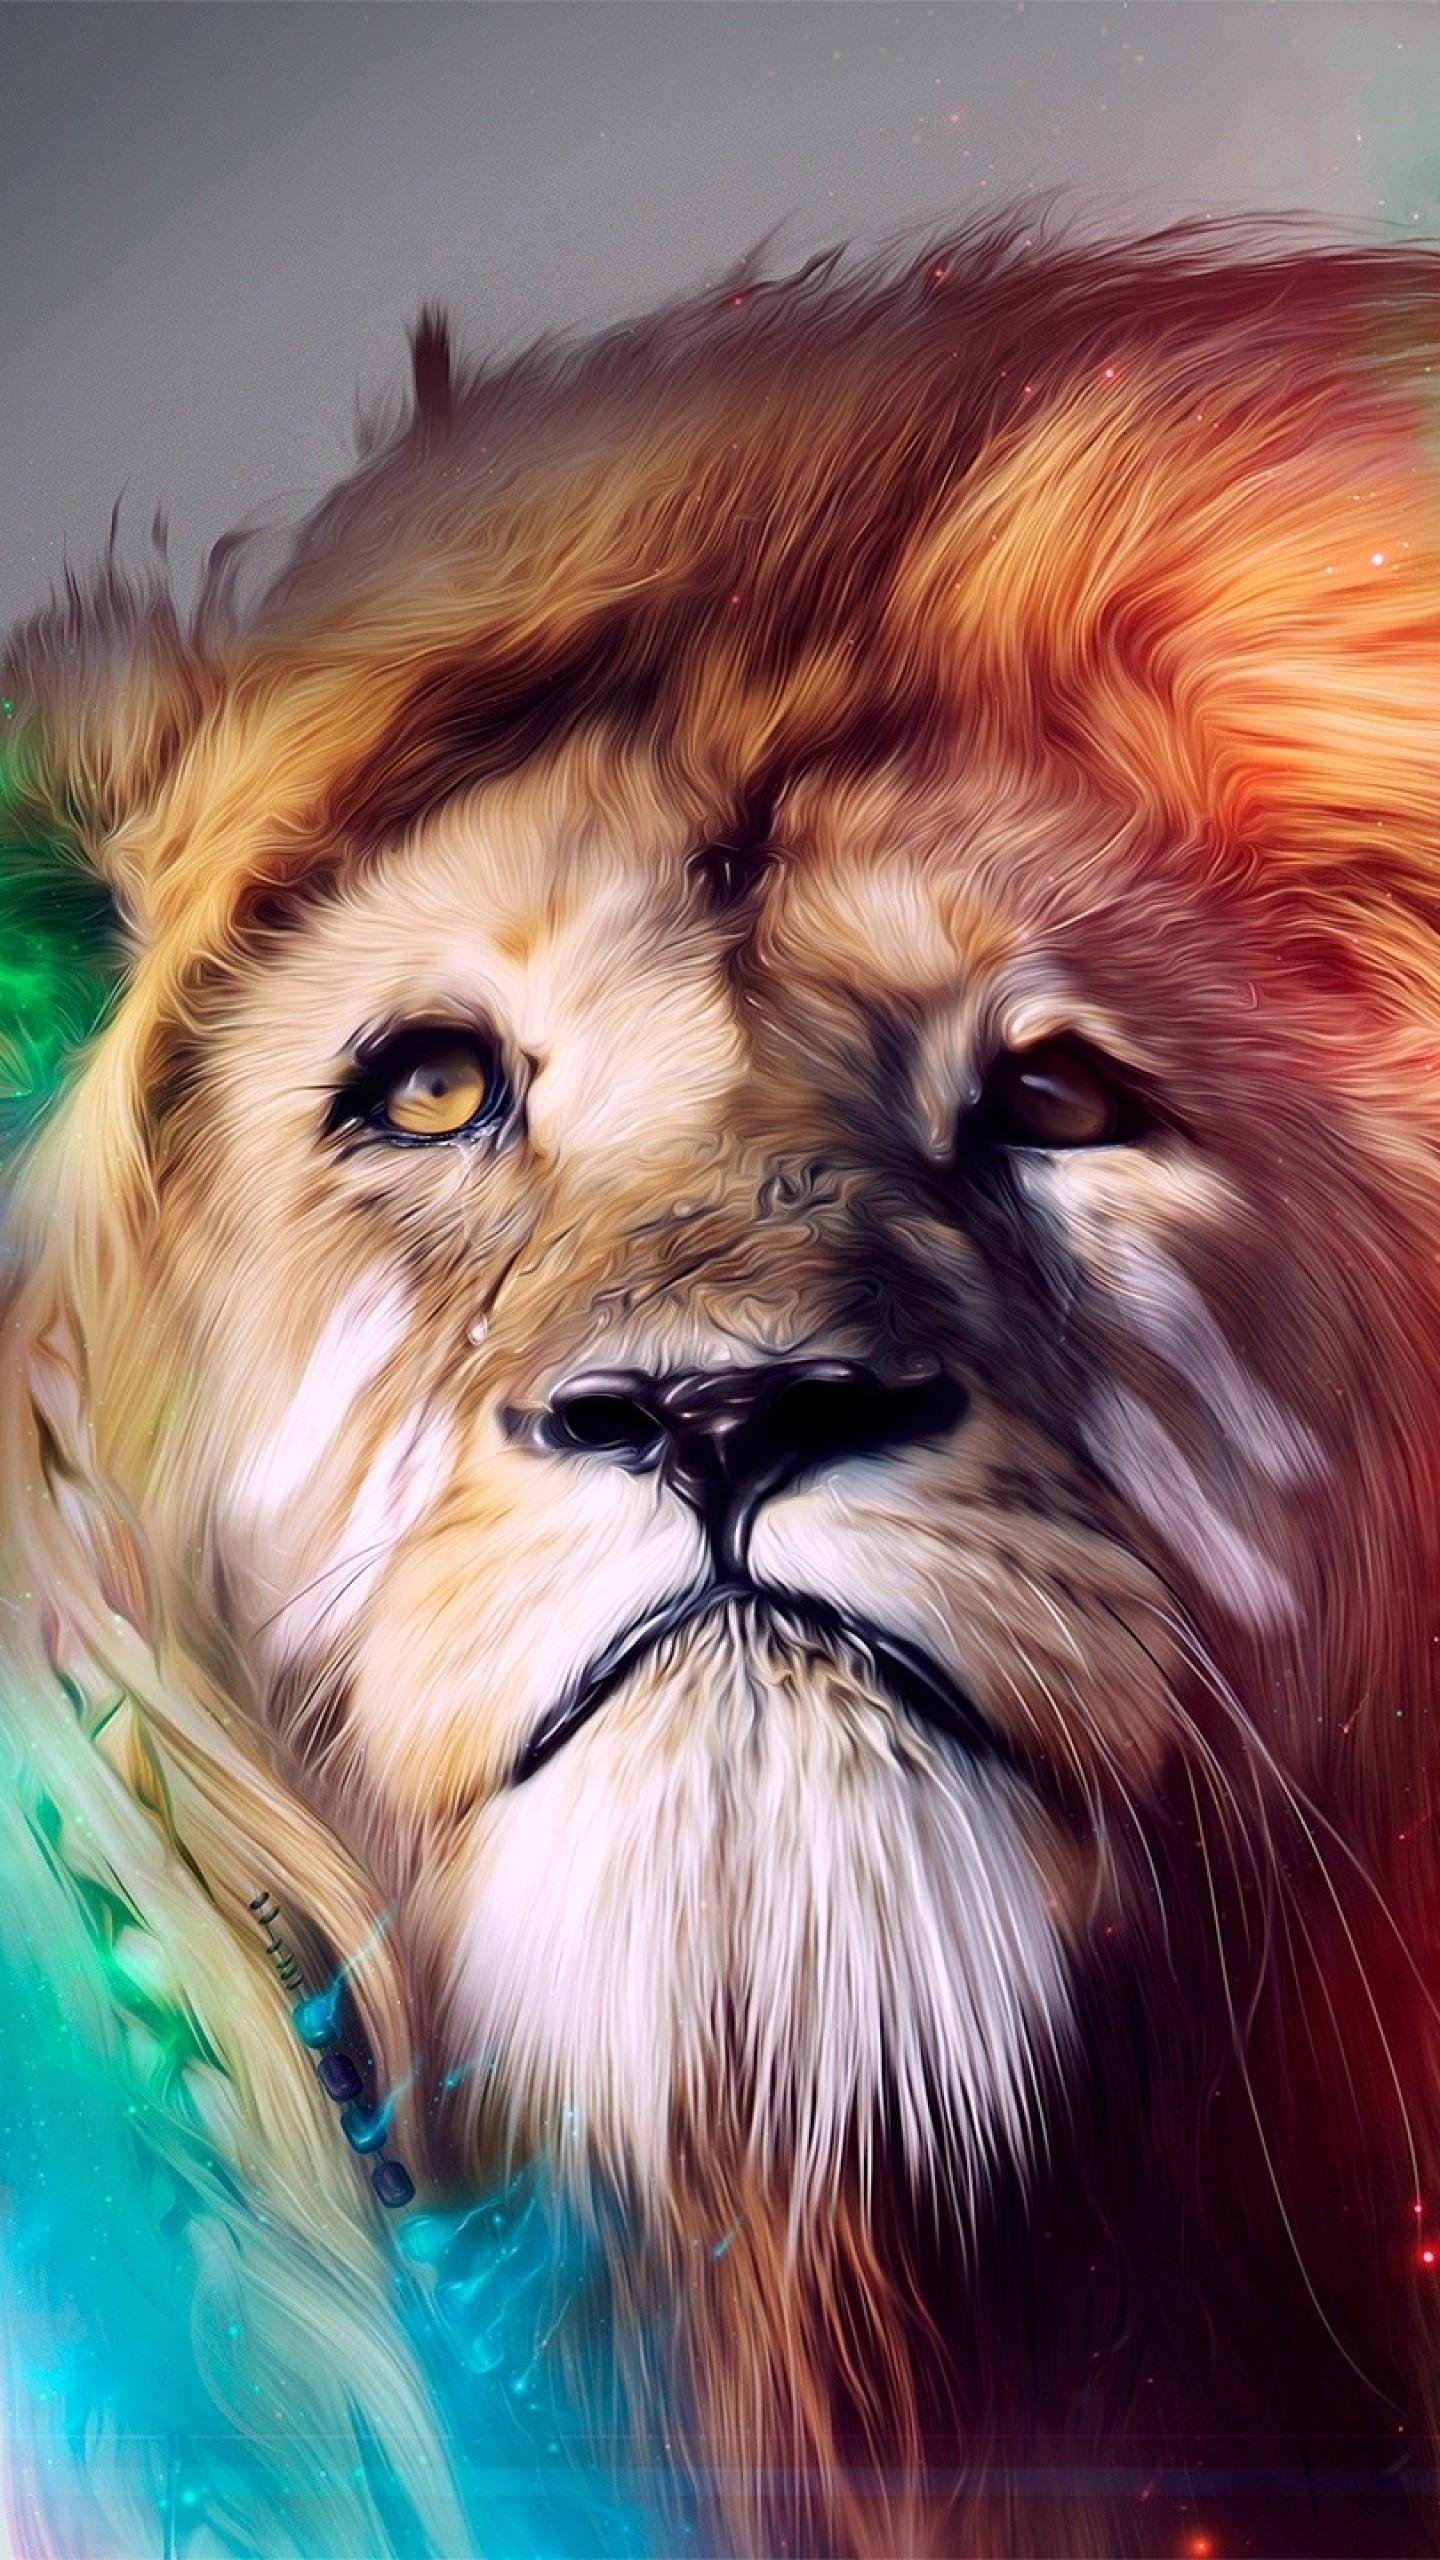 Wallpaper lion, big cat, face, smoke, colored